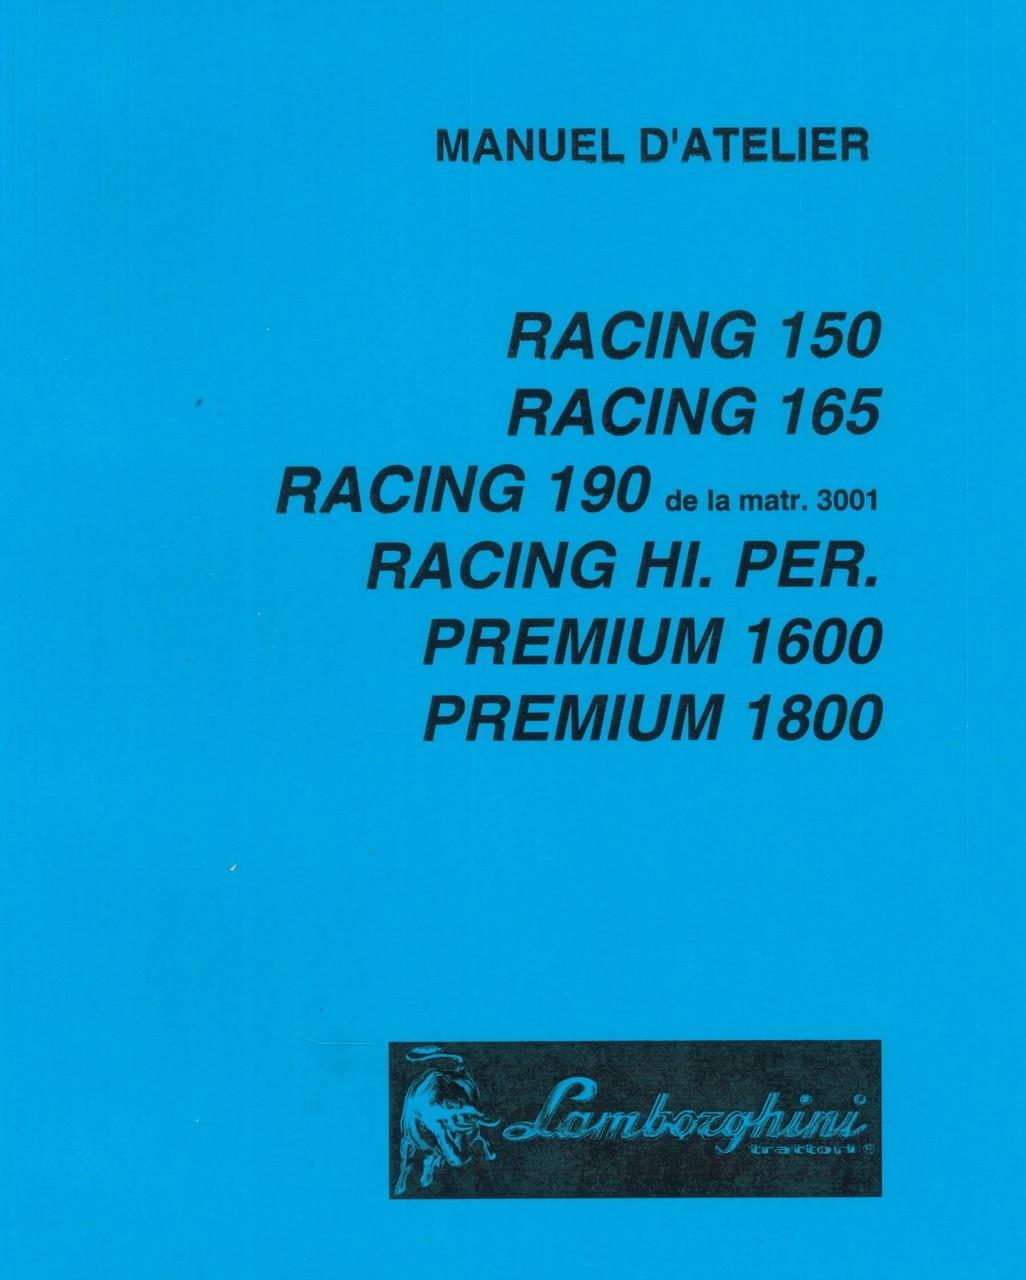 RACING 150 - RACING 165 - RACING 190 de la matr. 3001 - RACING HI. PER. - PREMIUM 1600 - PREMIUM 1800 - Manuel d'atelier